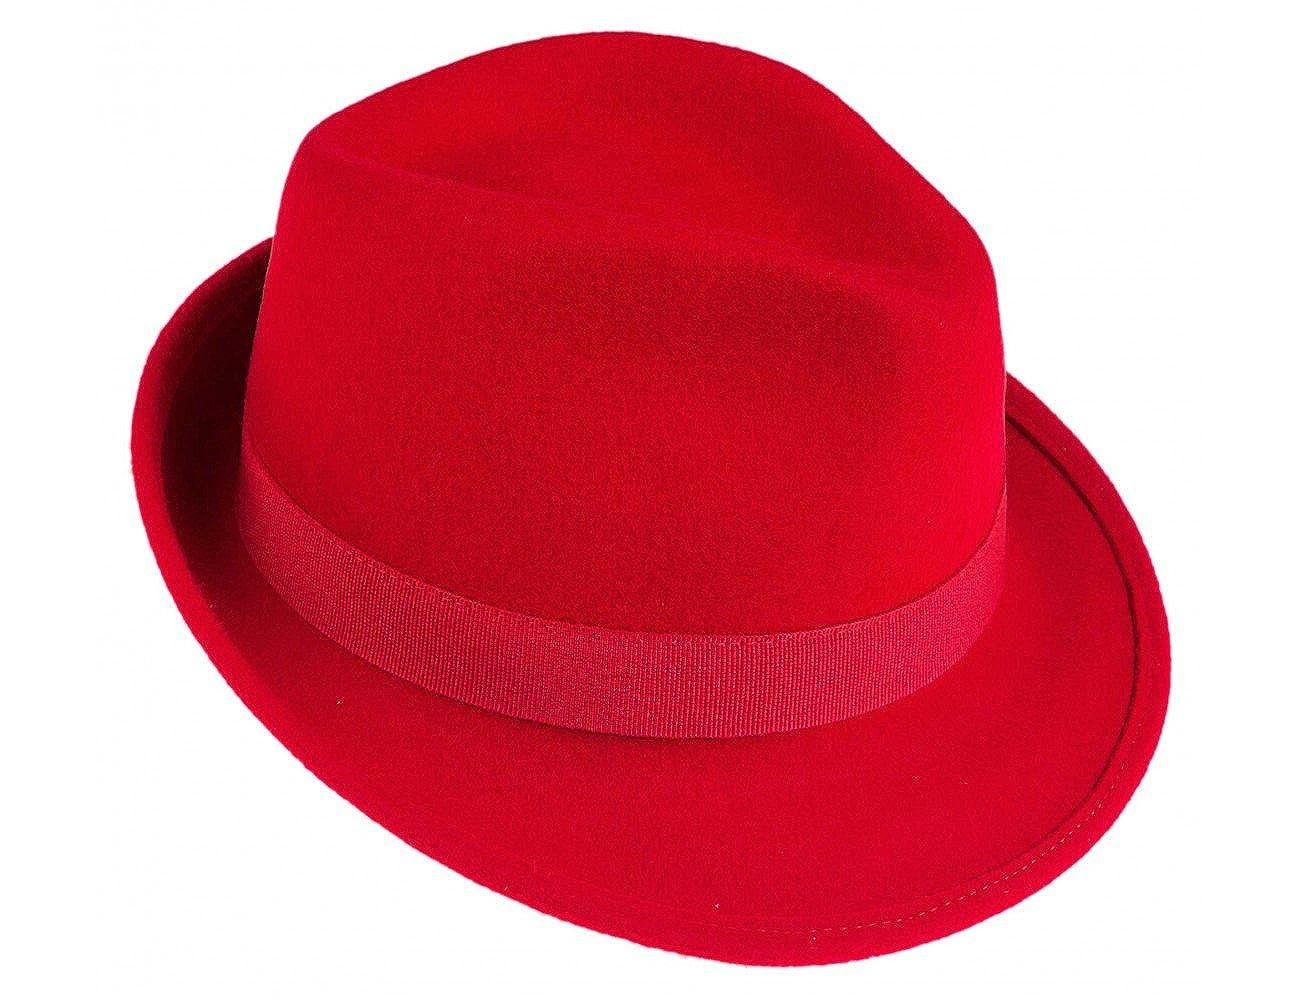 Ledatomica Cappello Donna Feltro stile Borsalino Jonathan